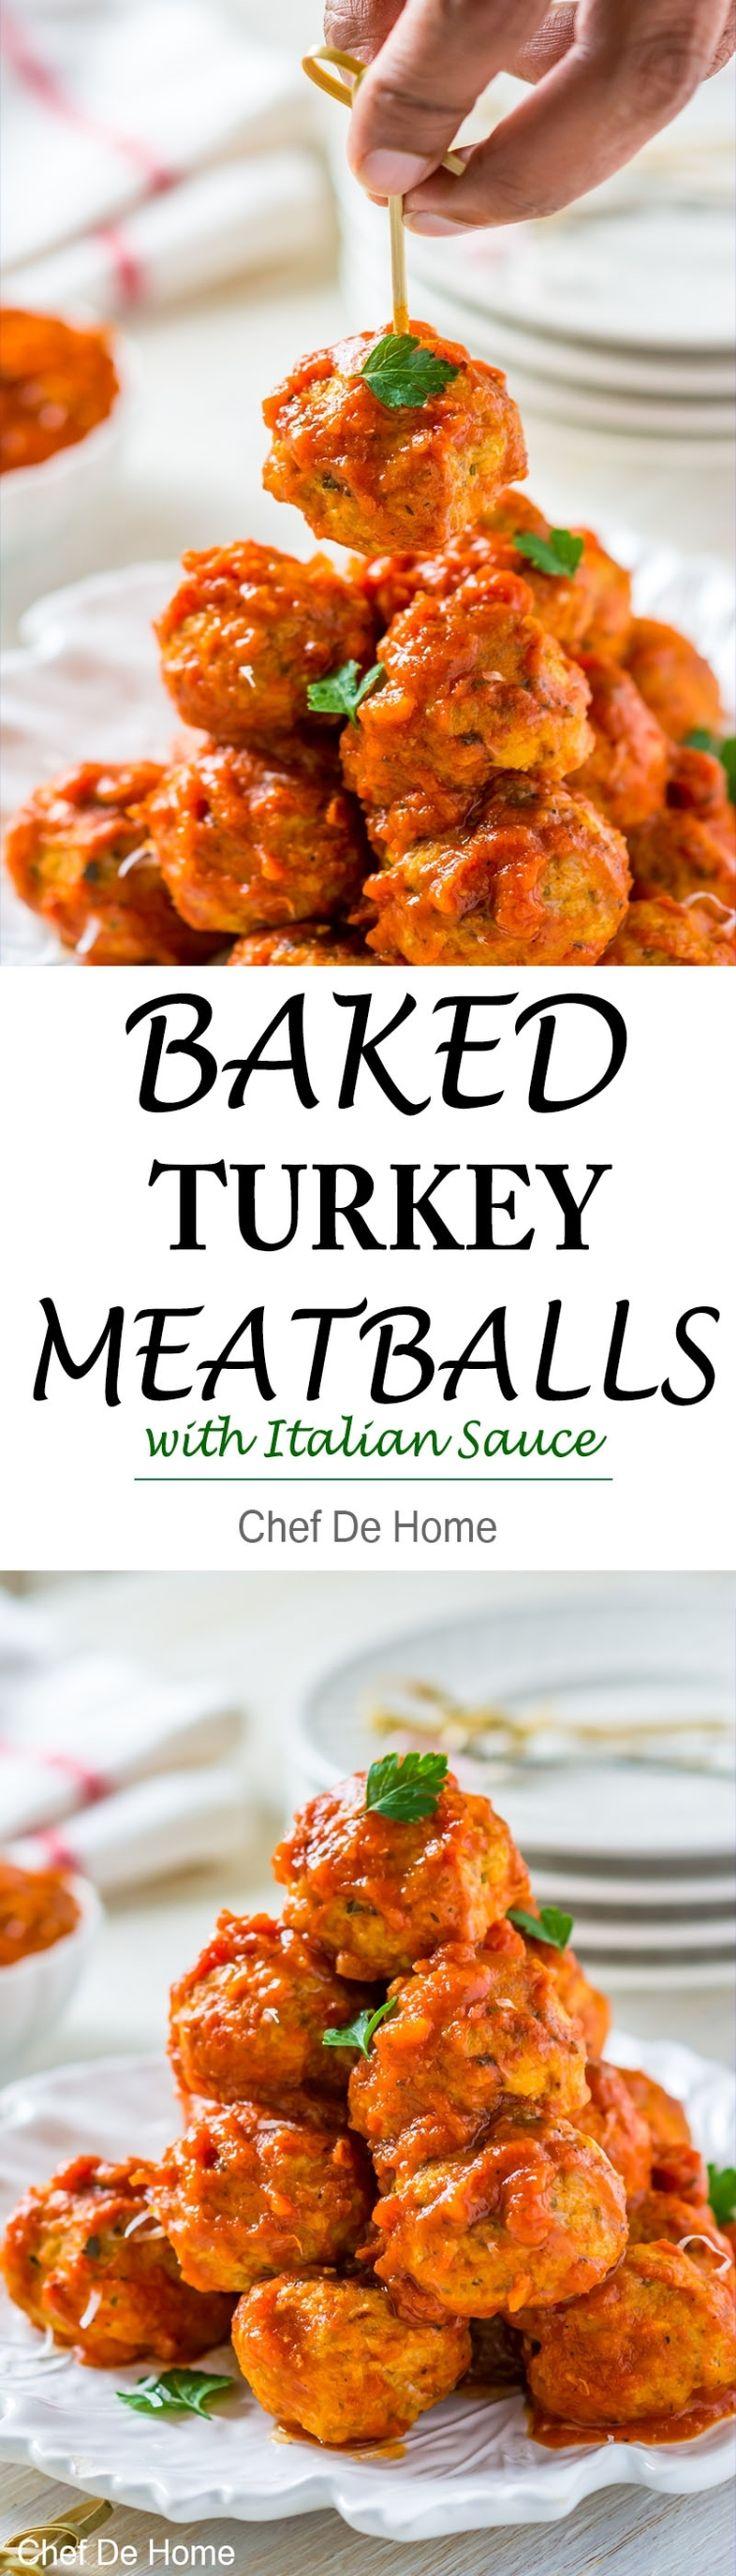 Baked not fried turkey meatballs coated in Italian marinara sauce | chefdehome.com